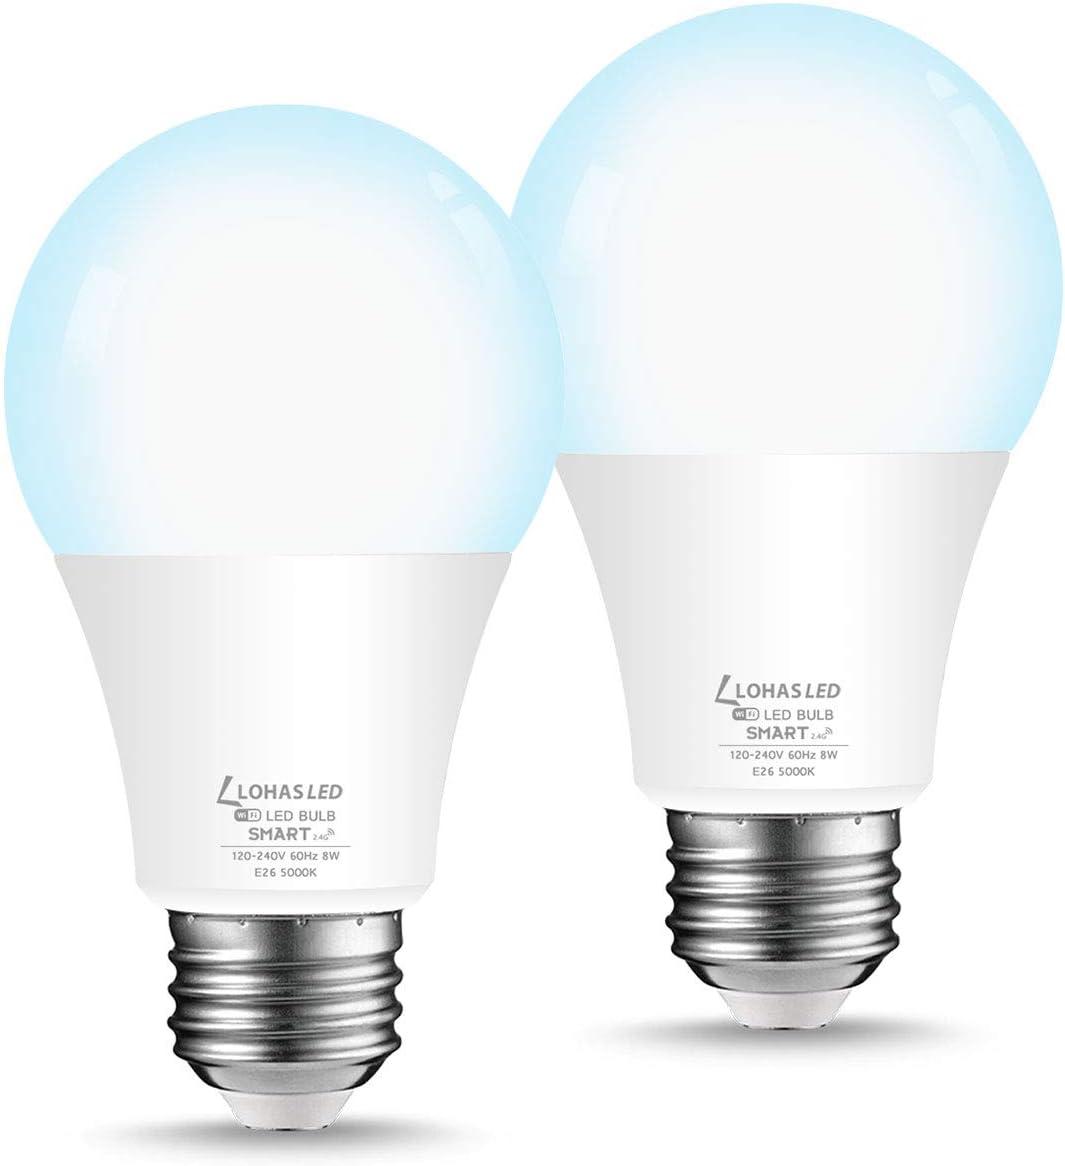 LOHAS Smart Light Bulb, Dimmable A19 LED Bulb 8W 50W Equivalent , E26 Base WiFi Bulb, Daylight White 5000K Smart LED Light Bulbs Works with Siri, Alexa, Google Home, 720LM, No Hub Required, 2 Pack